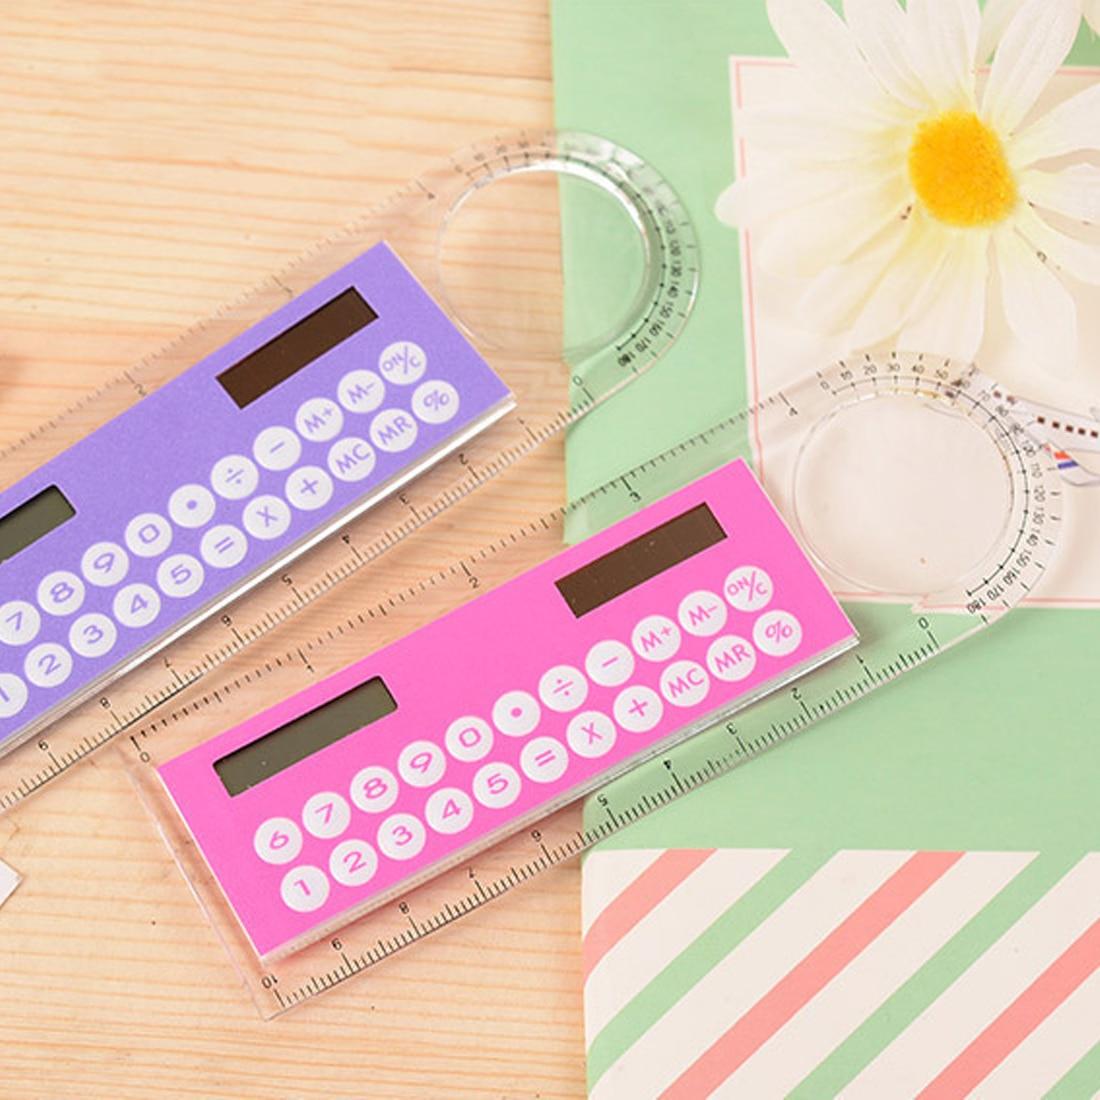 US $1 13 19% OFF|NOYOKERE Solar Mini Calculator Magnifier Multifunction  10cm Ultra thin Ruler Calculadora Office Supplies Random Color-in  Calculators